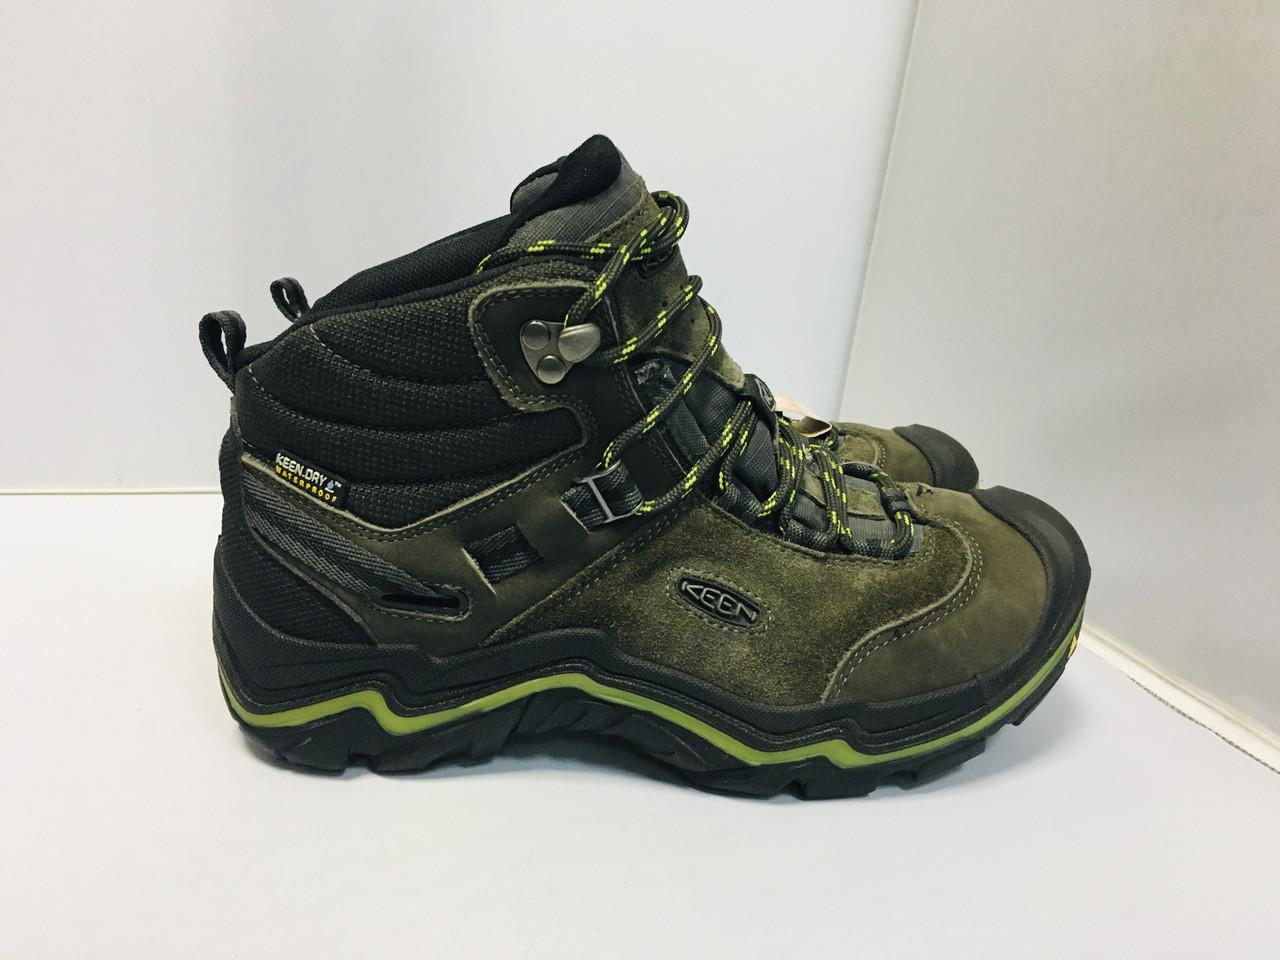 Зимние ботинки Keen, 37,5 размер